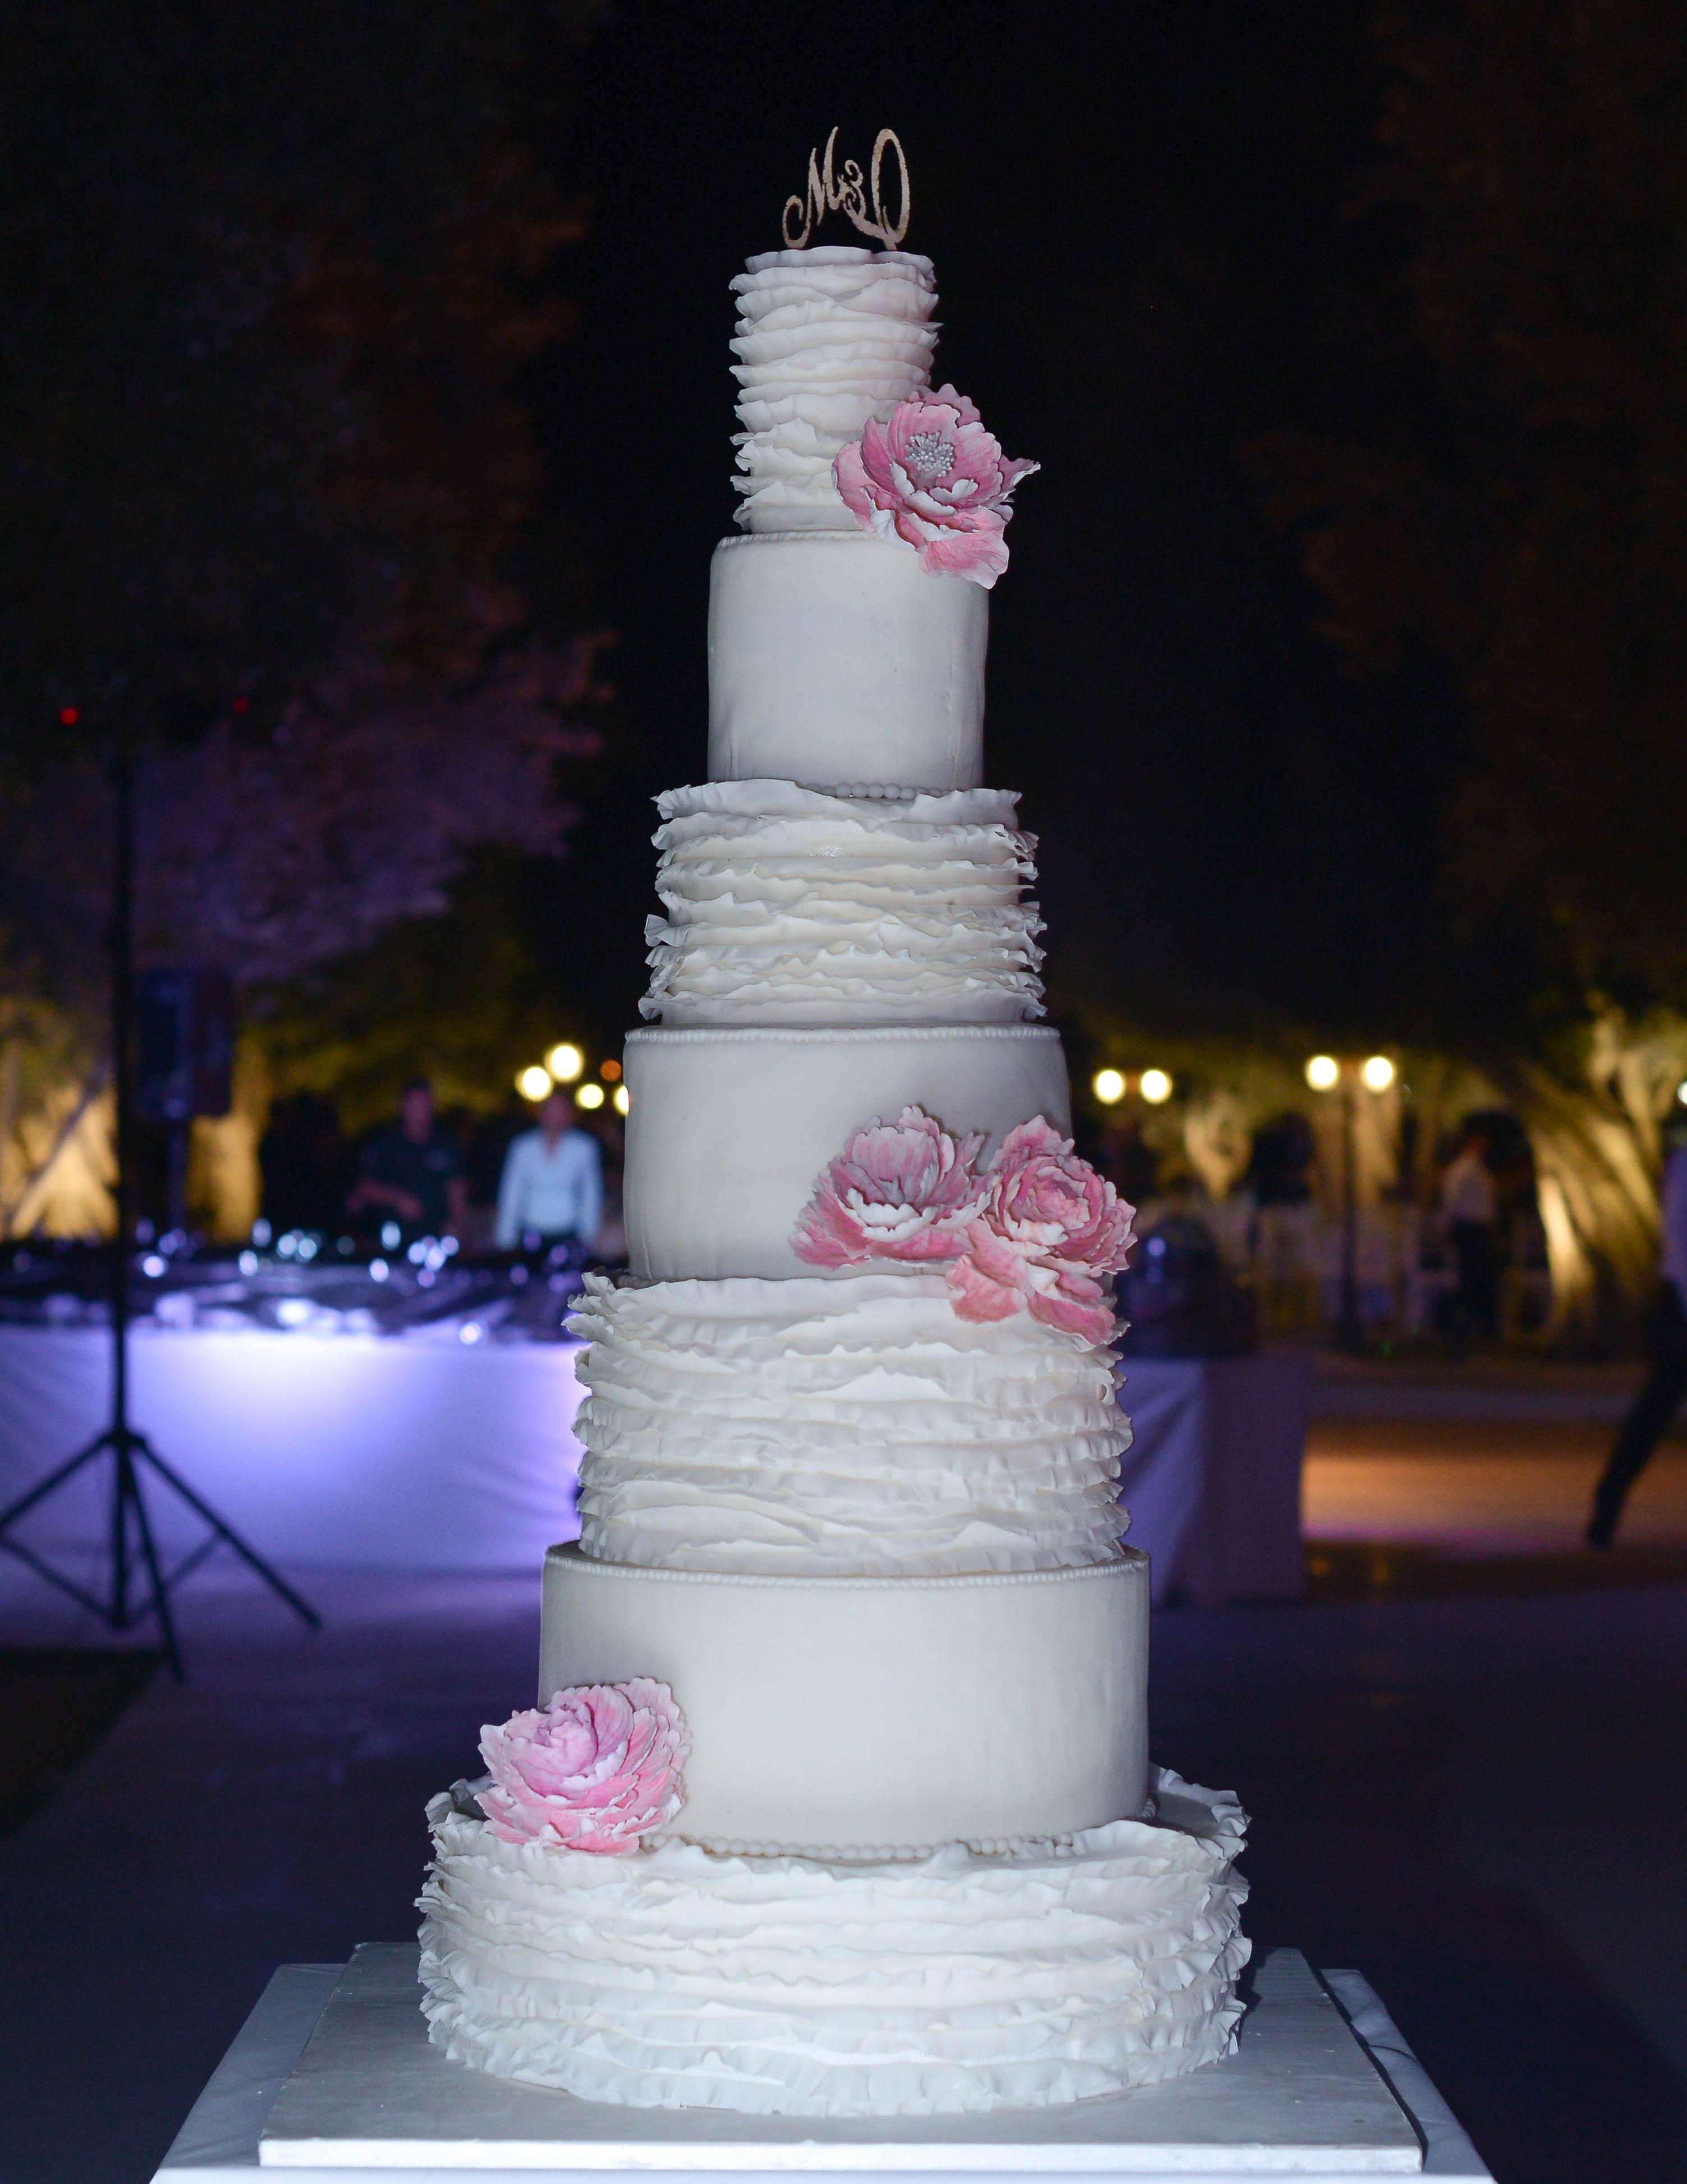 Tall Tower Cake in Abu Dhabi